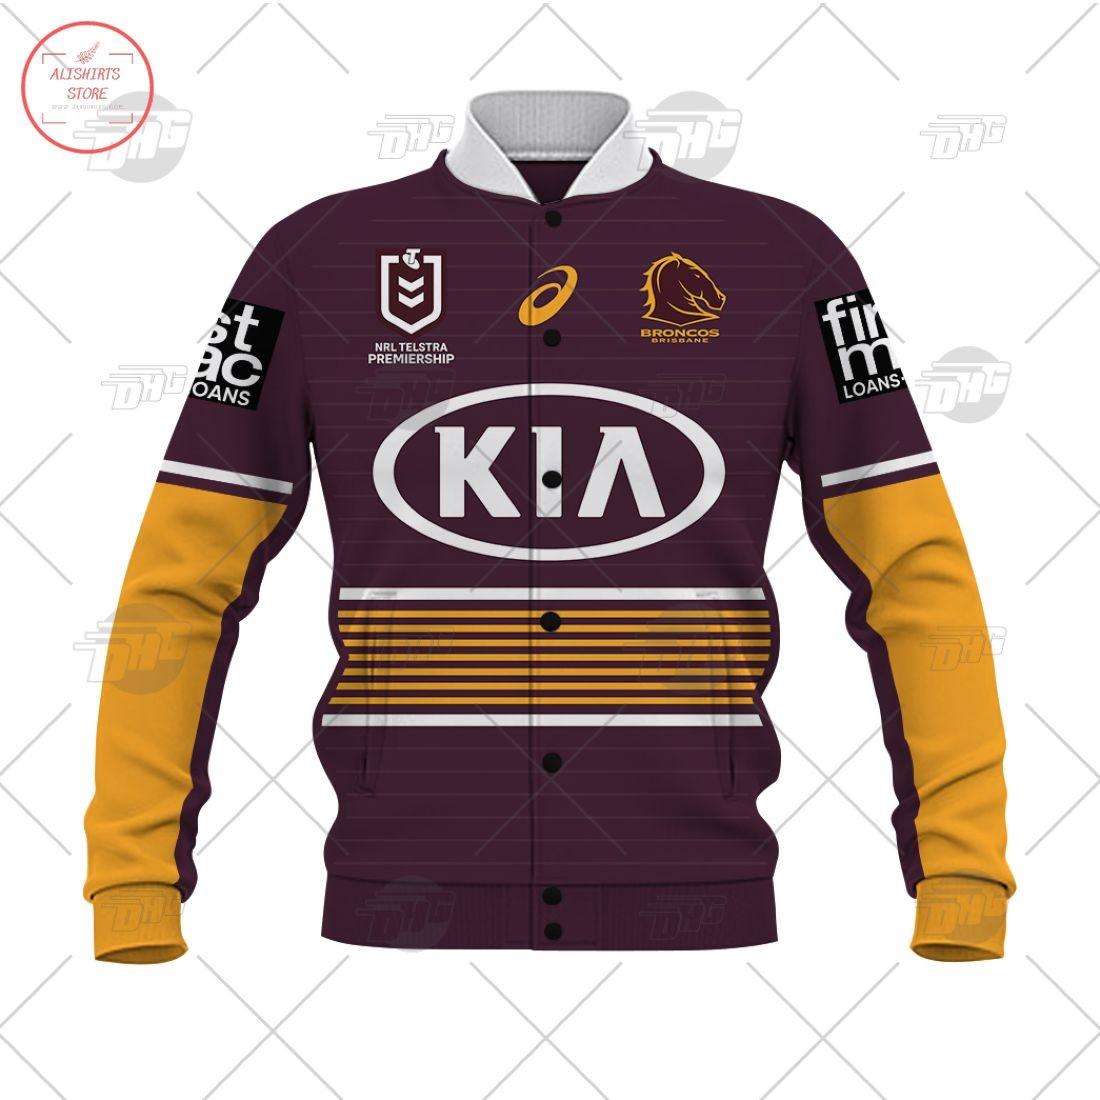 Personalized NRL Brisbane Broncos 2021 Letterman Jacket